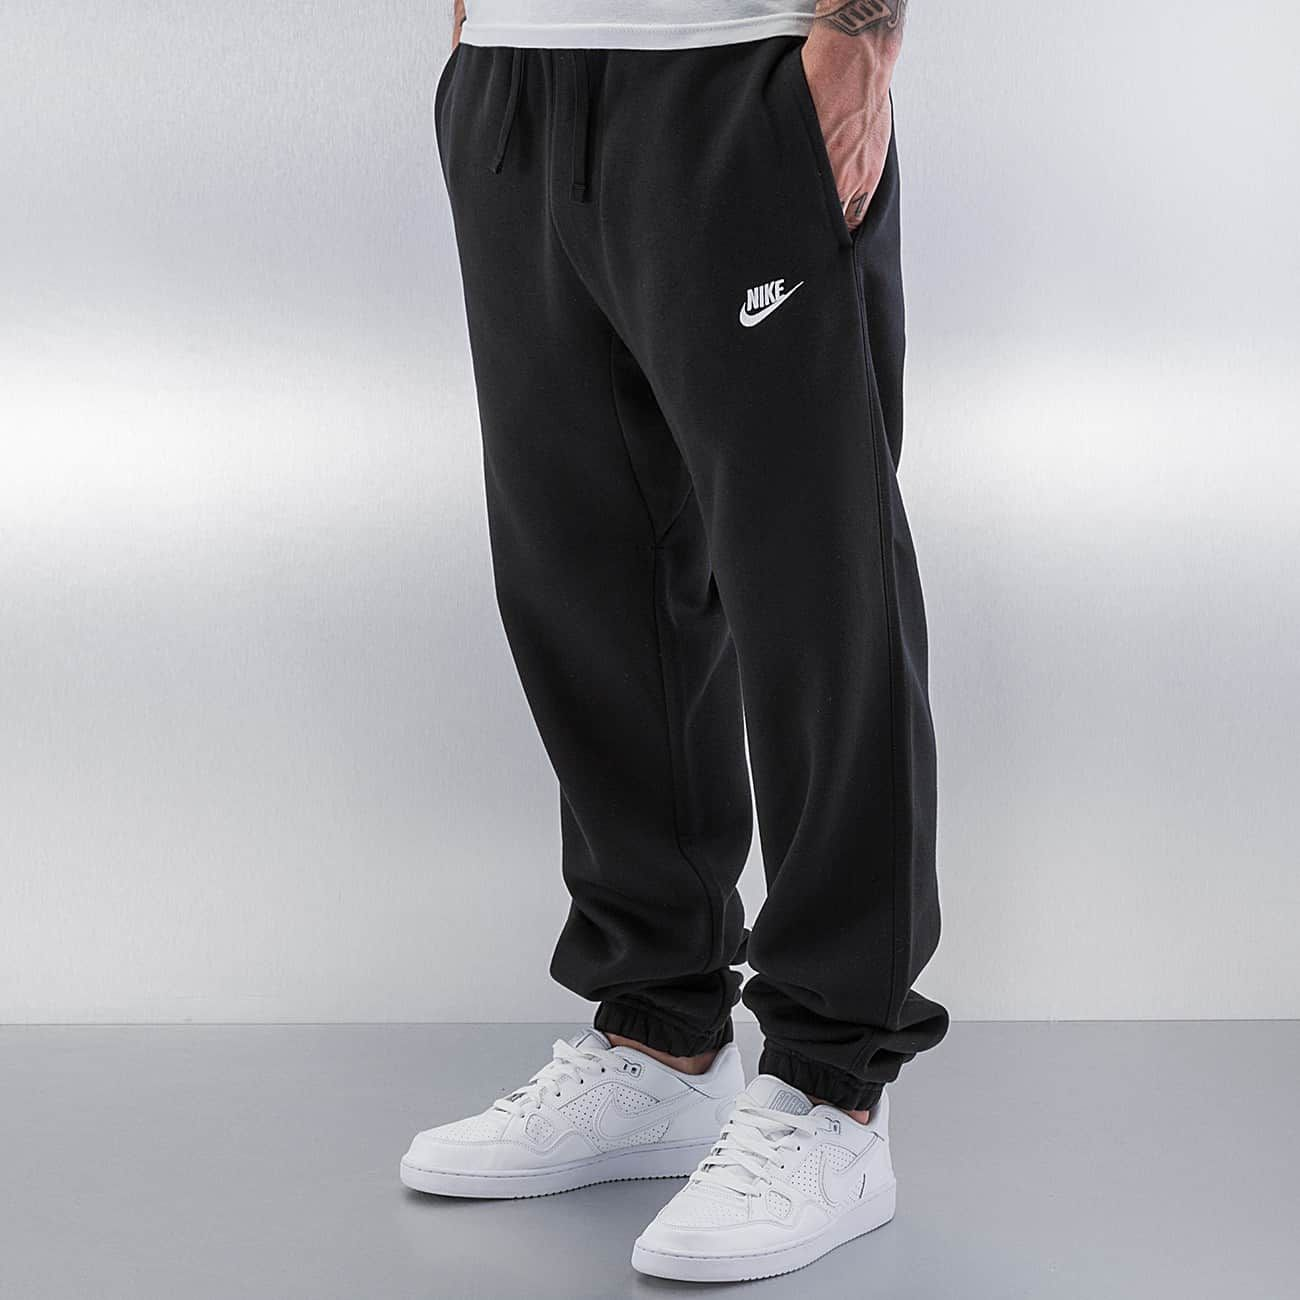 reputable site d7cd3 e7aef Nike Jogginghose schwarz